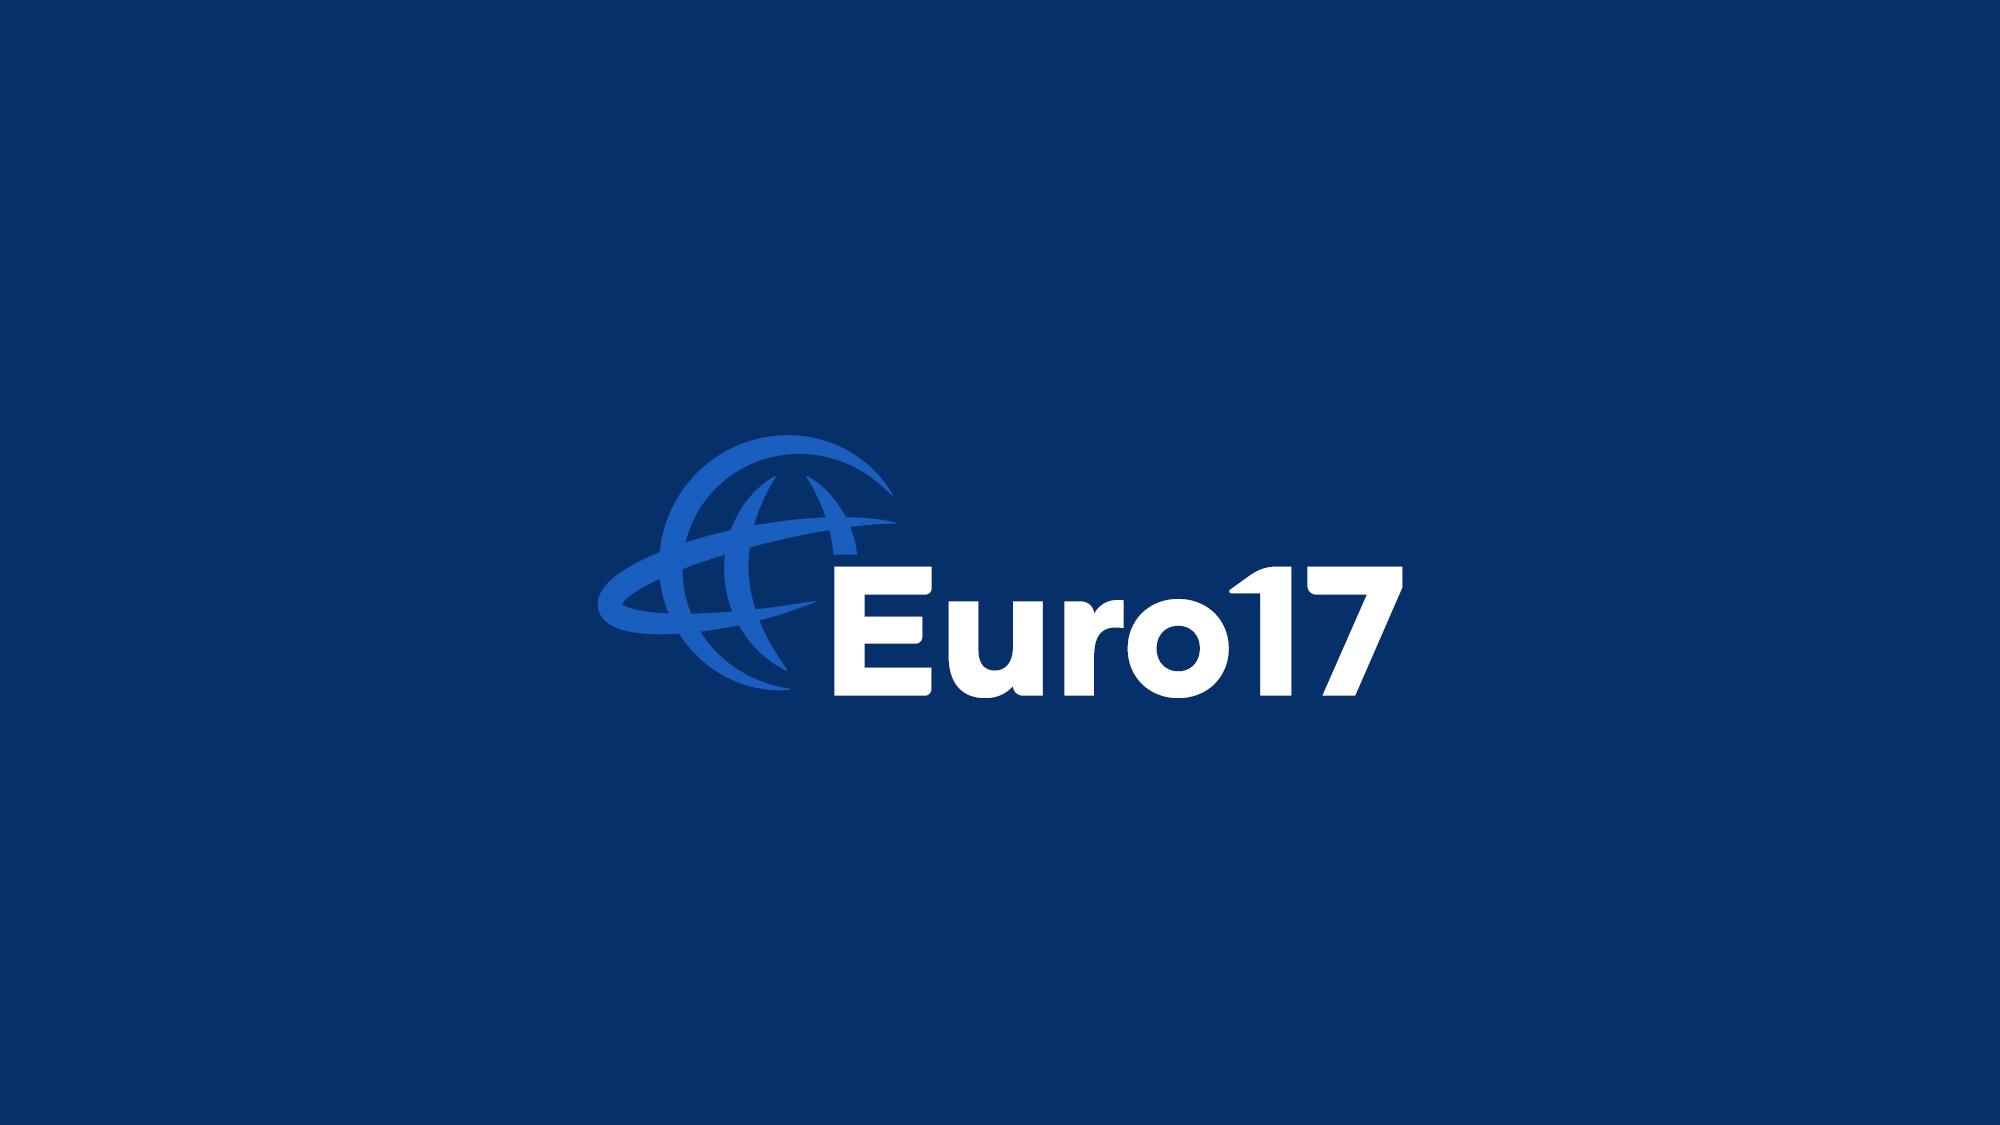 Lanatta-Branding-Euro-17-3